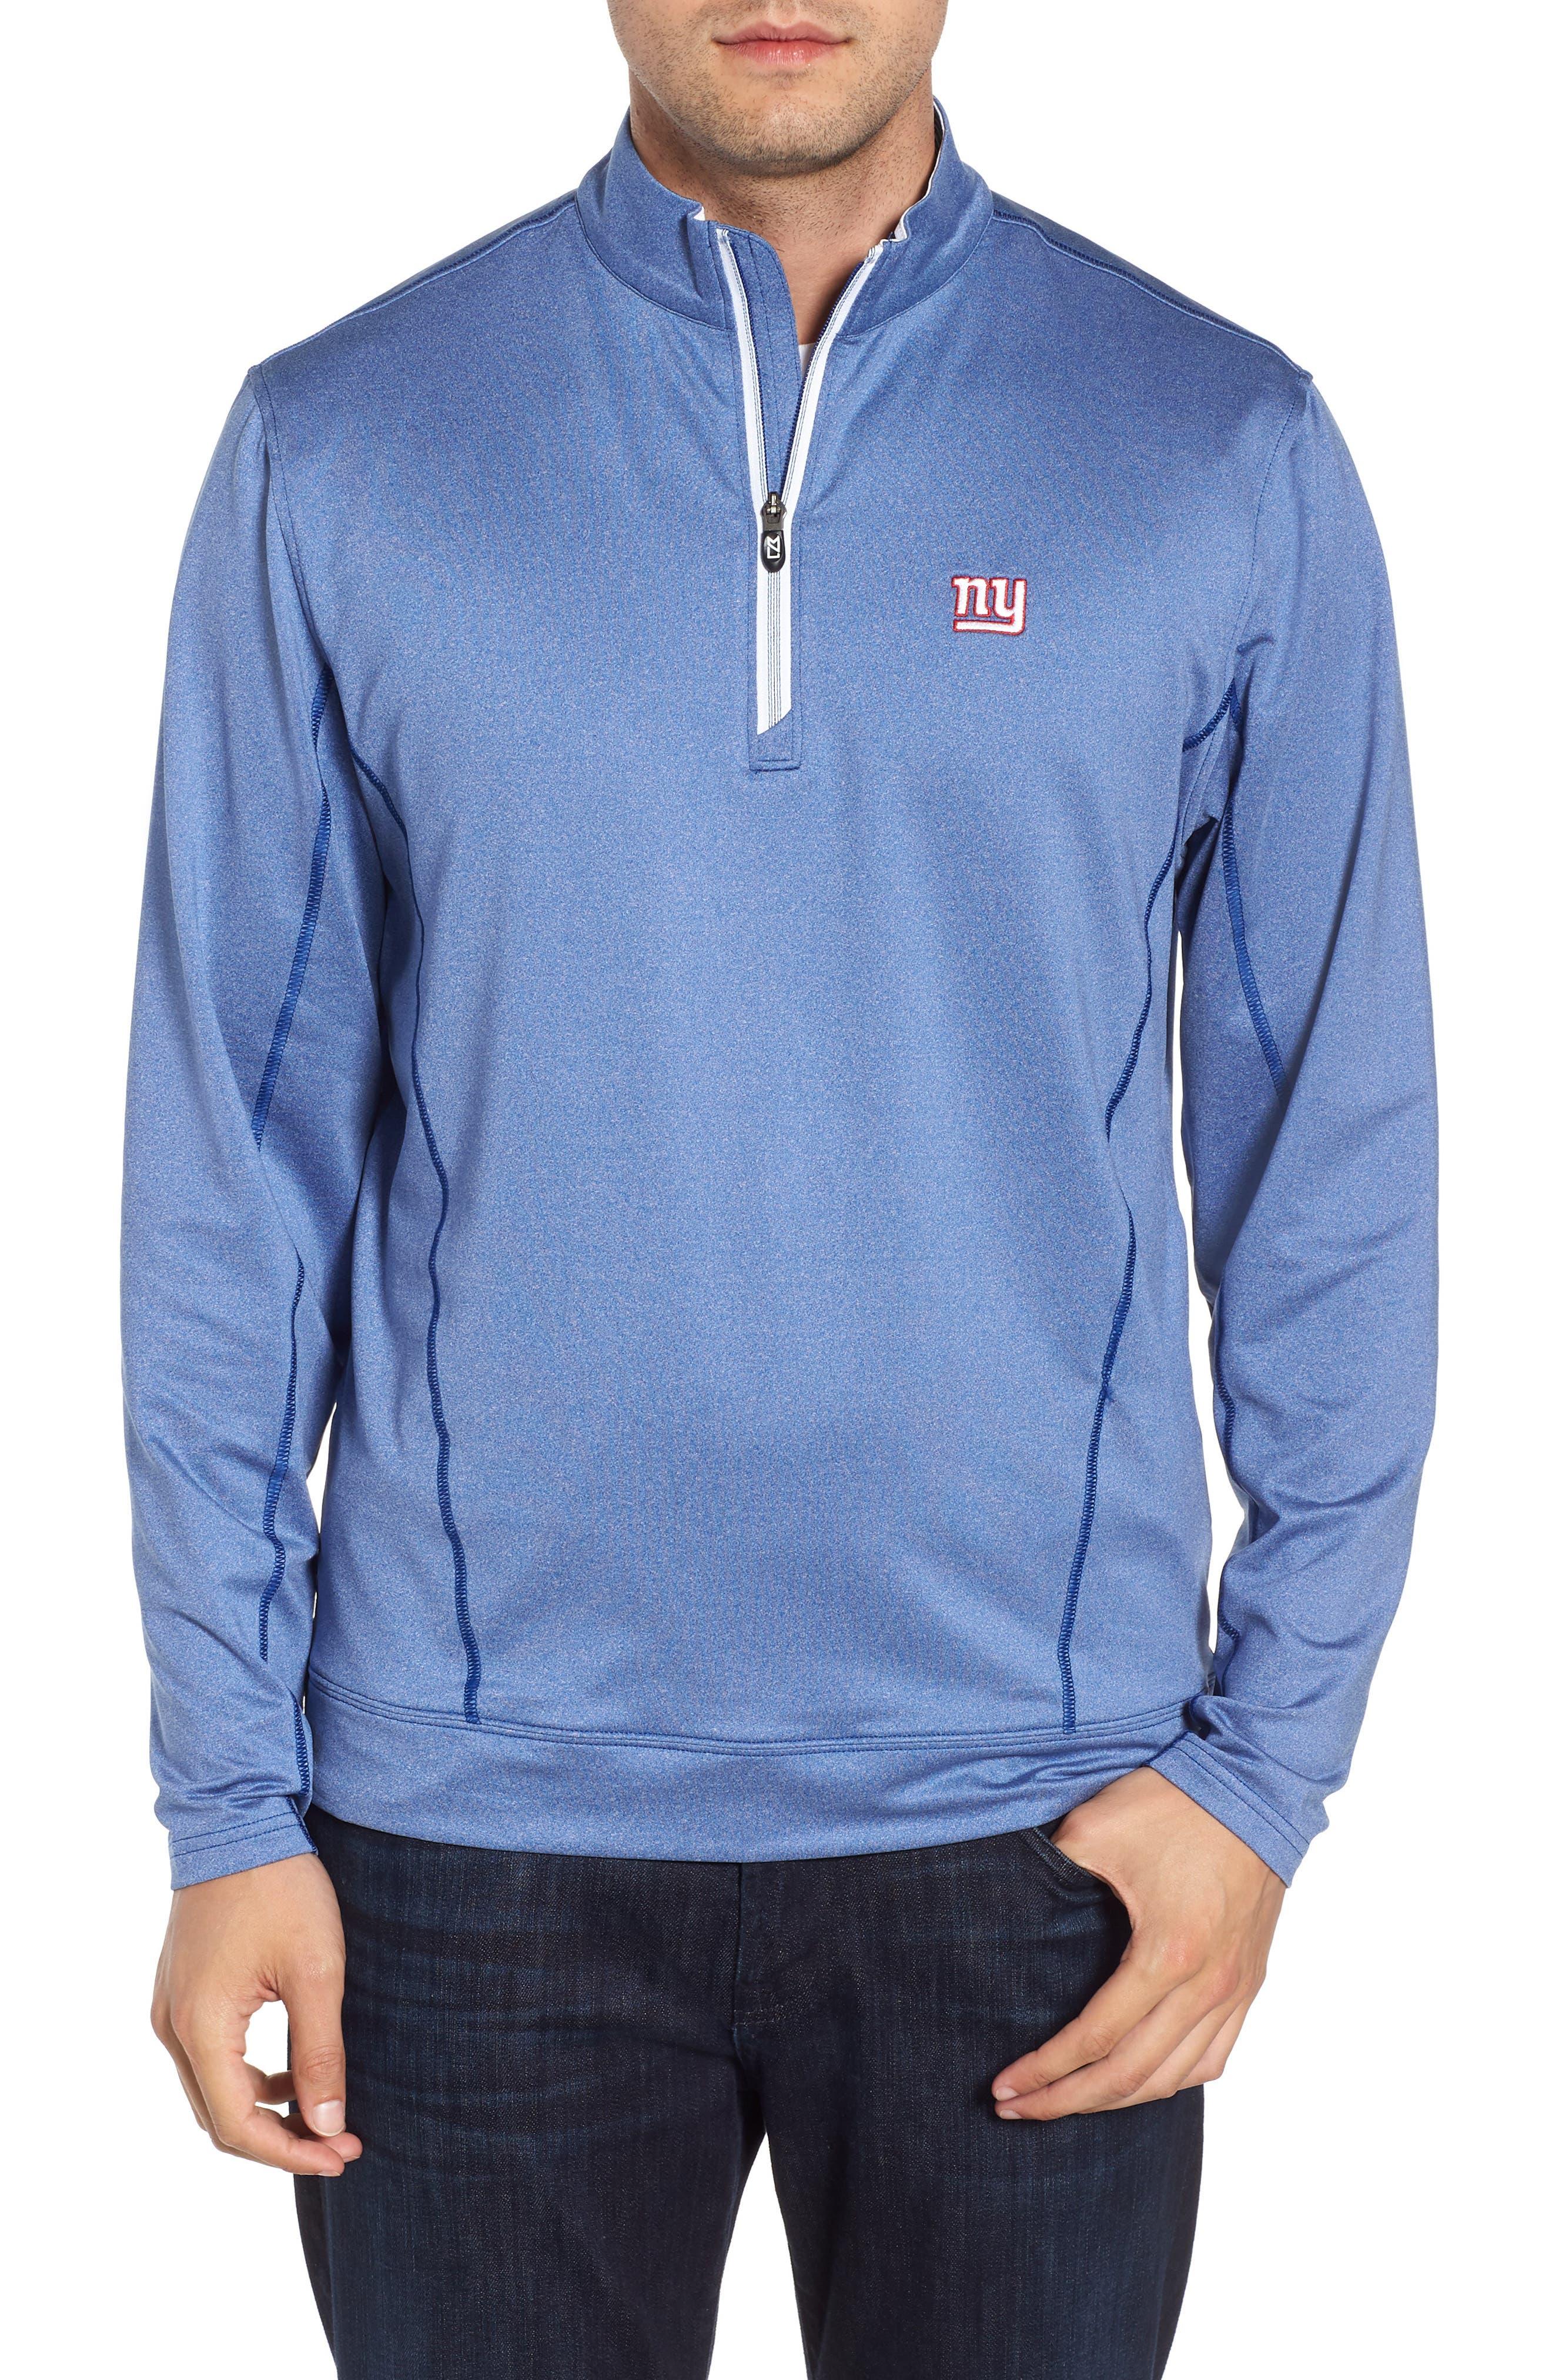 Endurance New York Giants Regular Fit Pullover,                             Main thumbnail 1, color,                             TOUR BLUE HEATHER